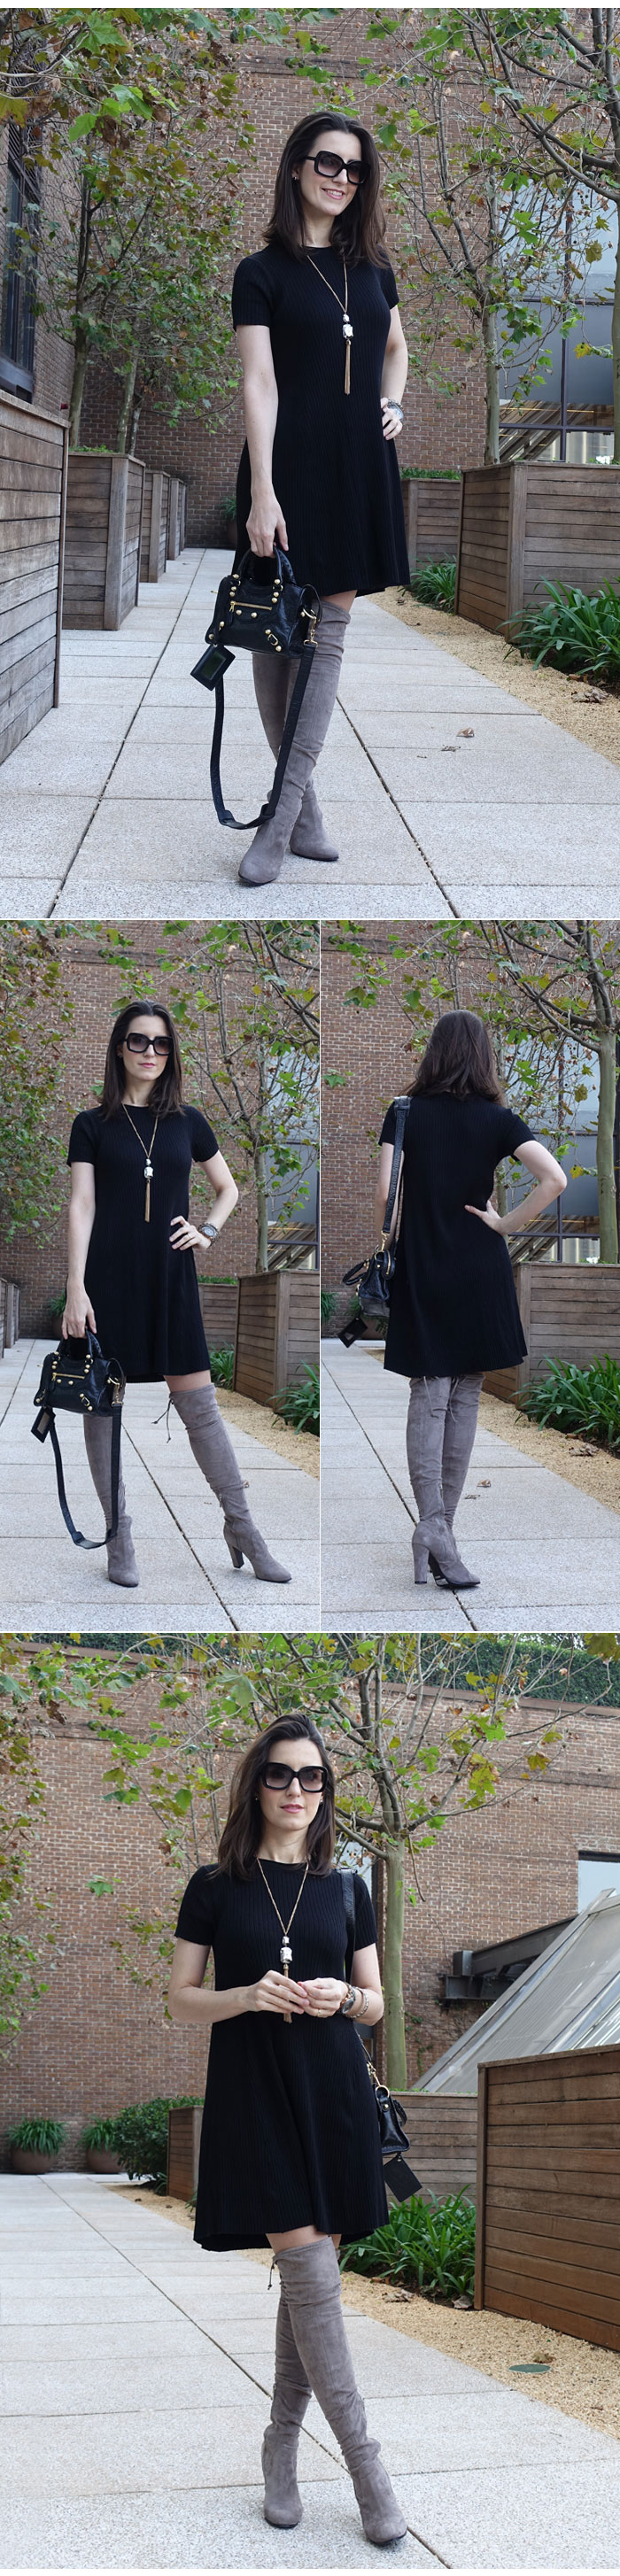 vestido-preto-de-trico-bota-cuissard